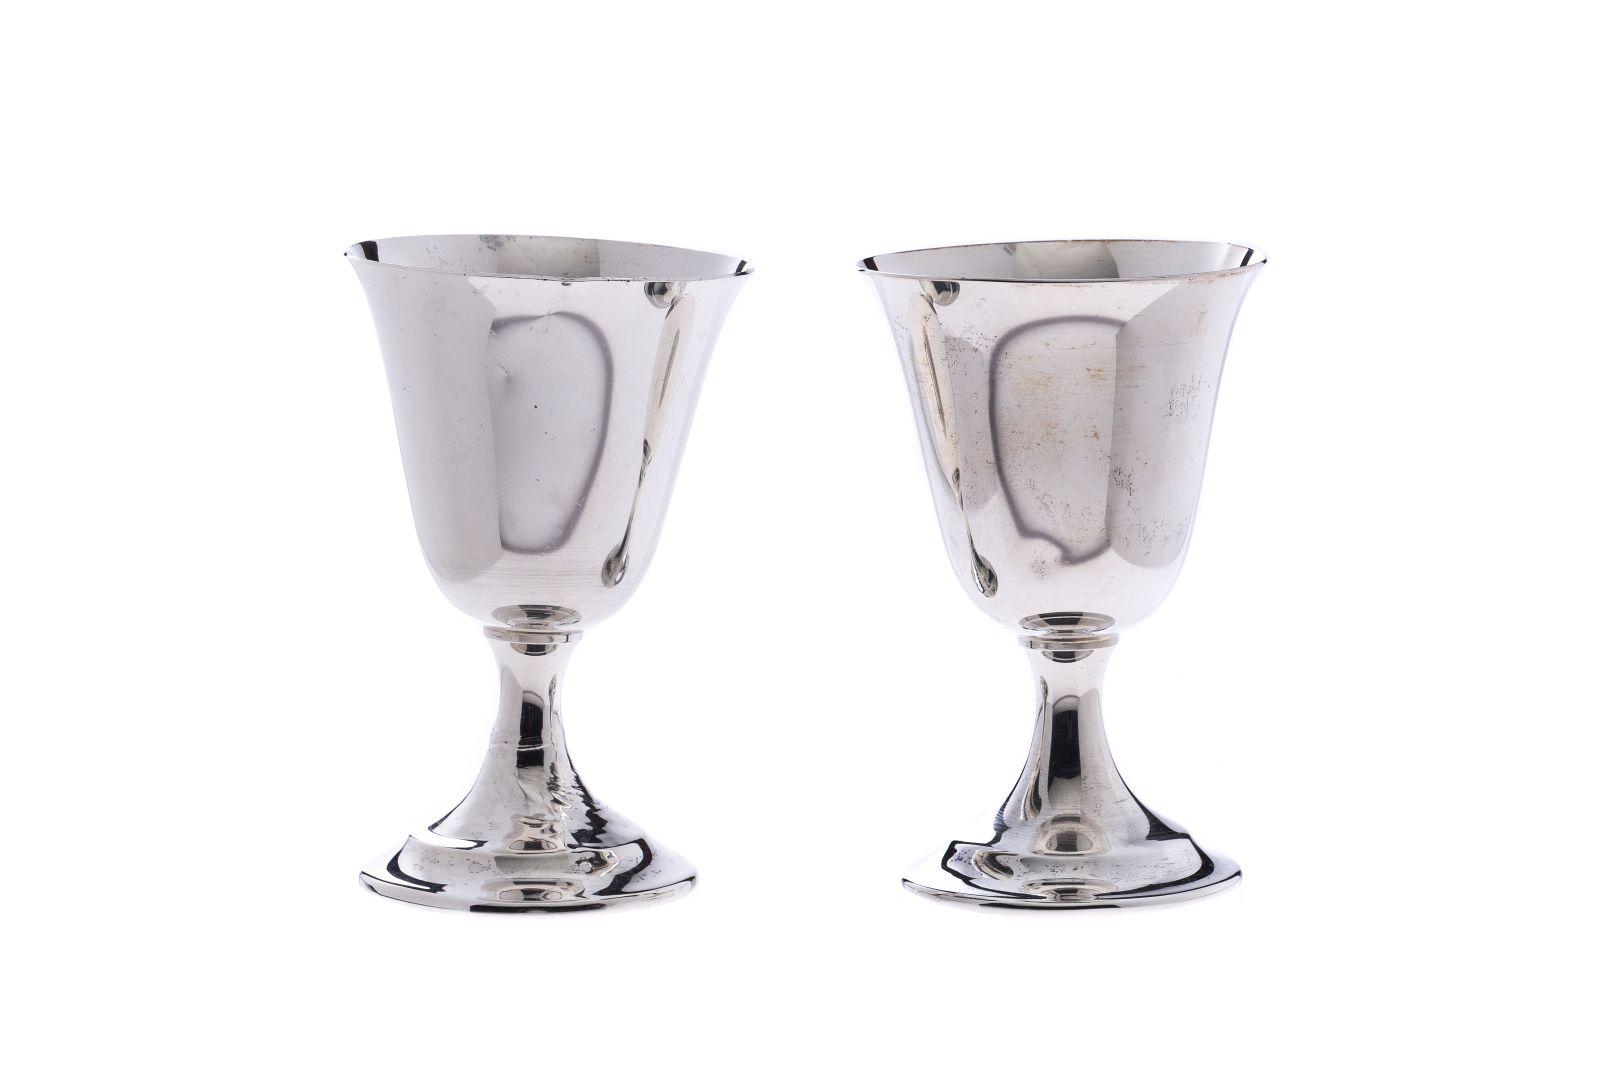 #113 Wine goblets | Weinpokale Image